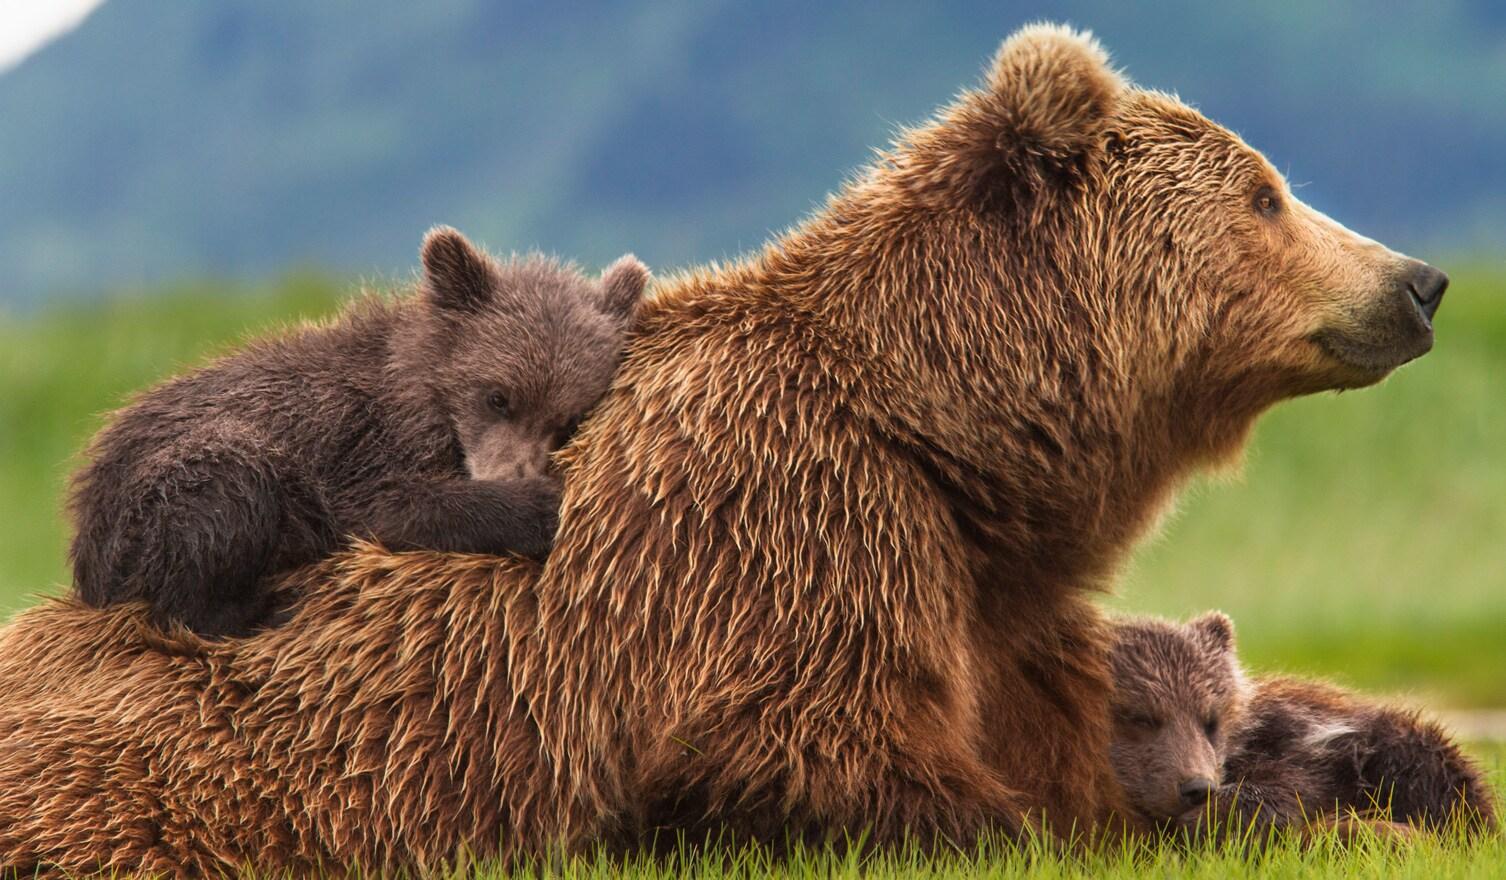 The Bear's Den: July 29, 2016 - Windy City Gridiron